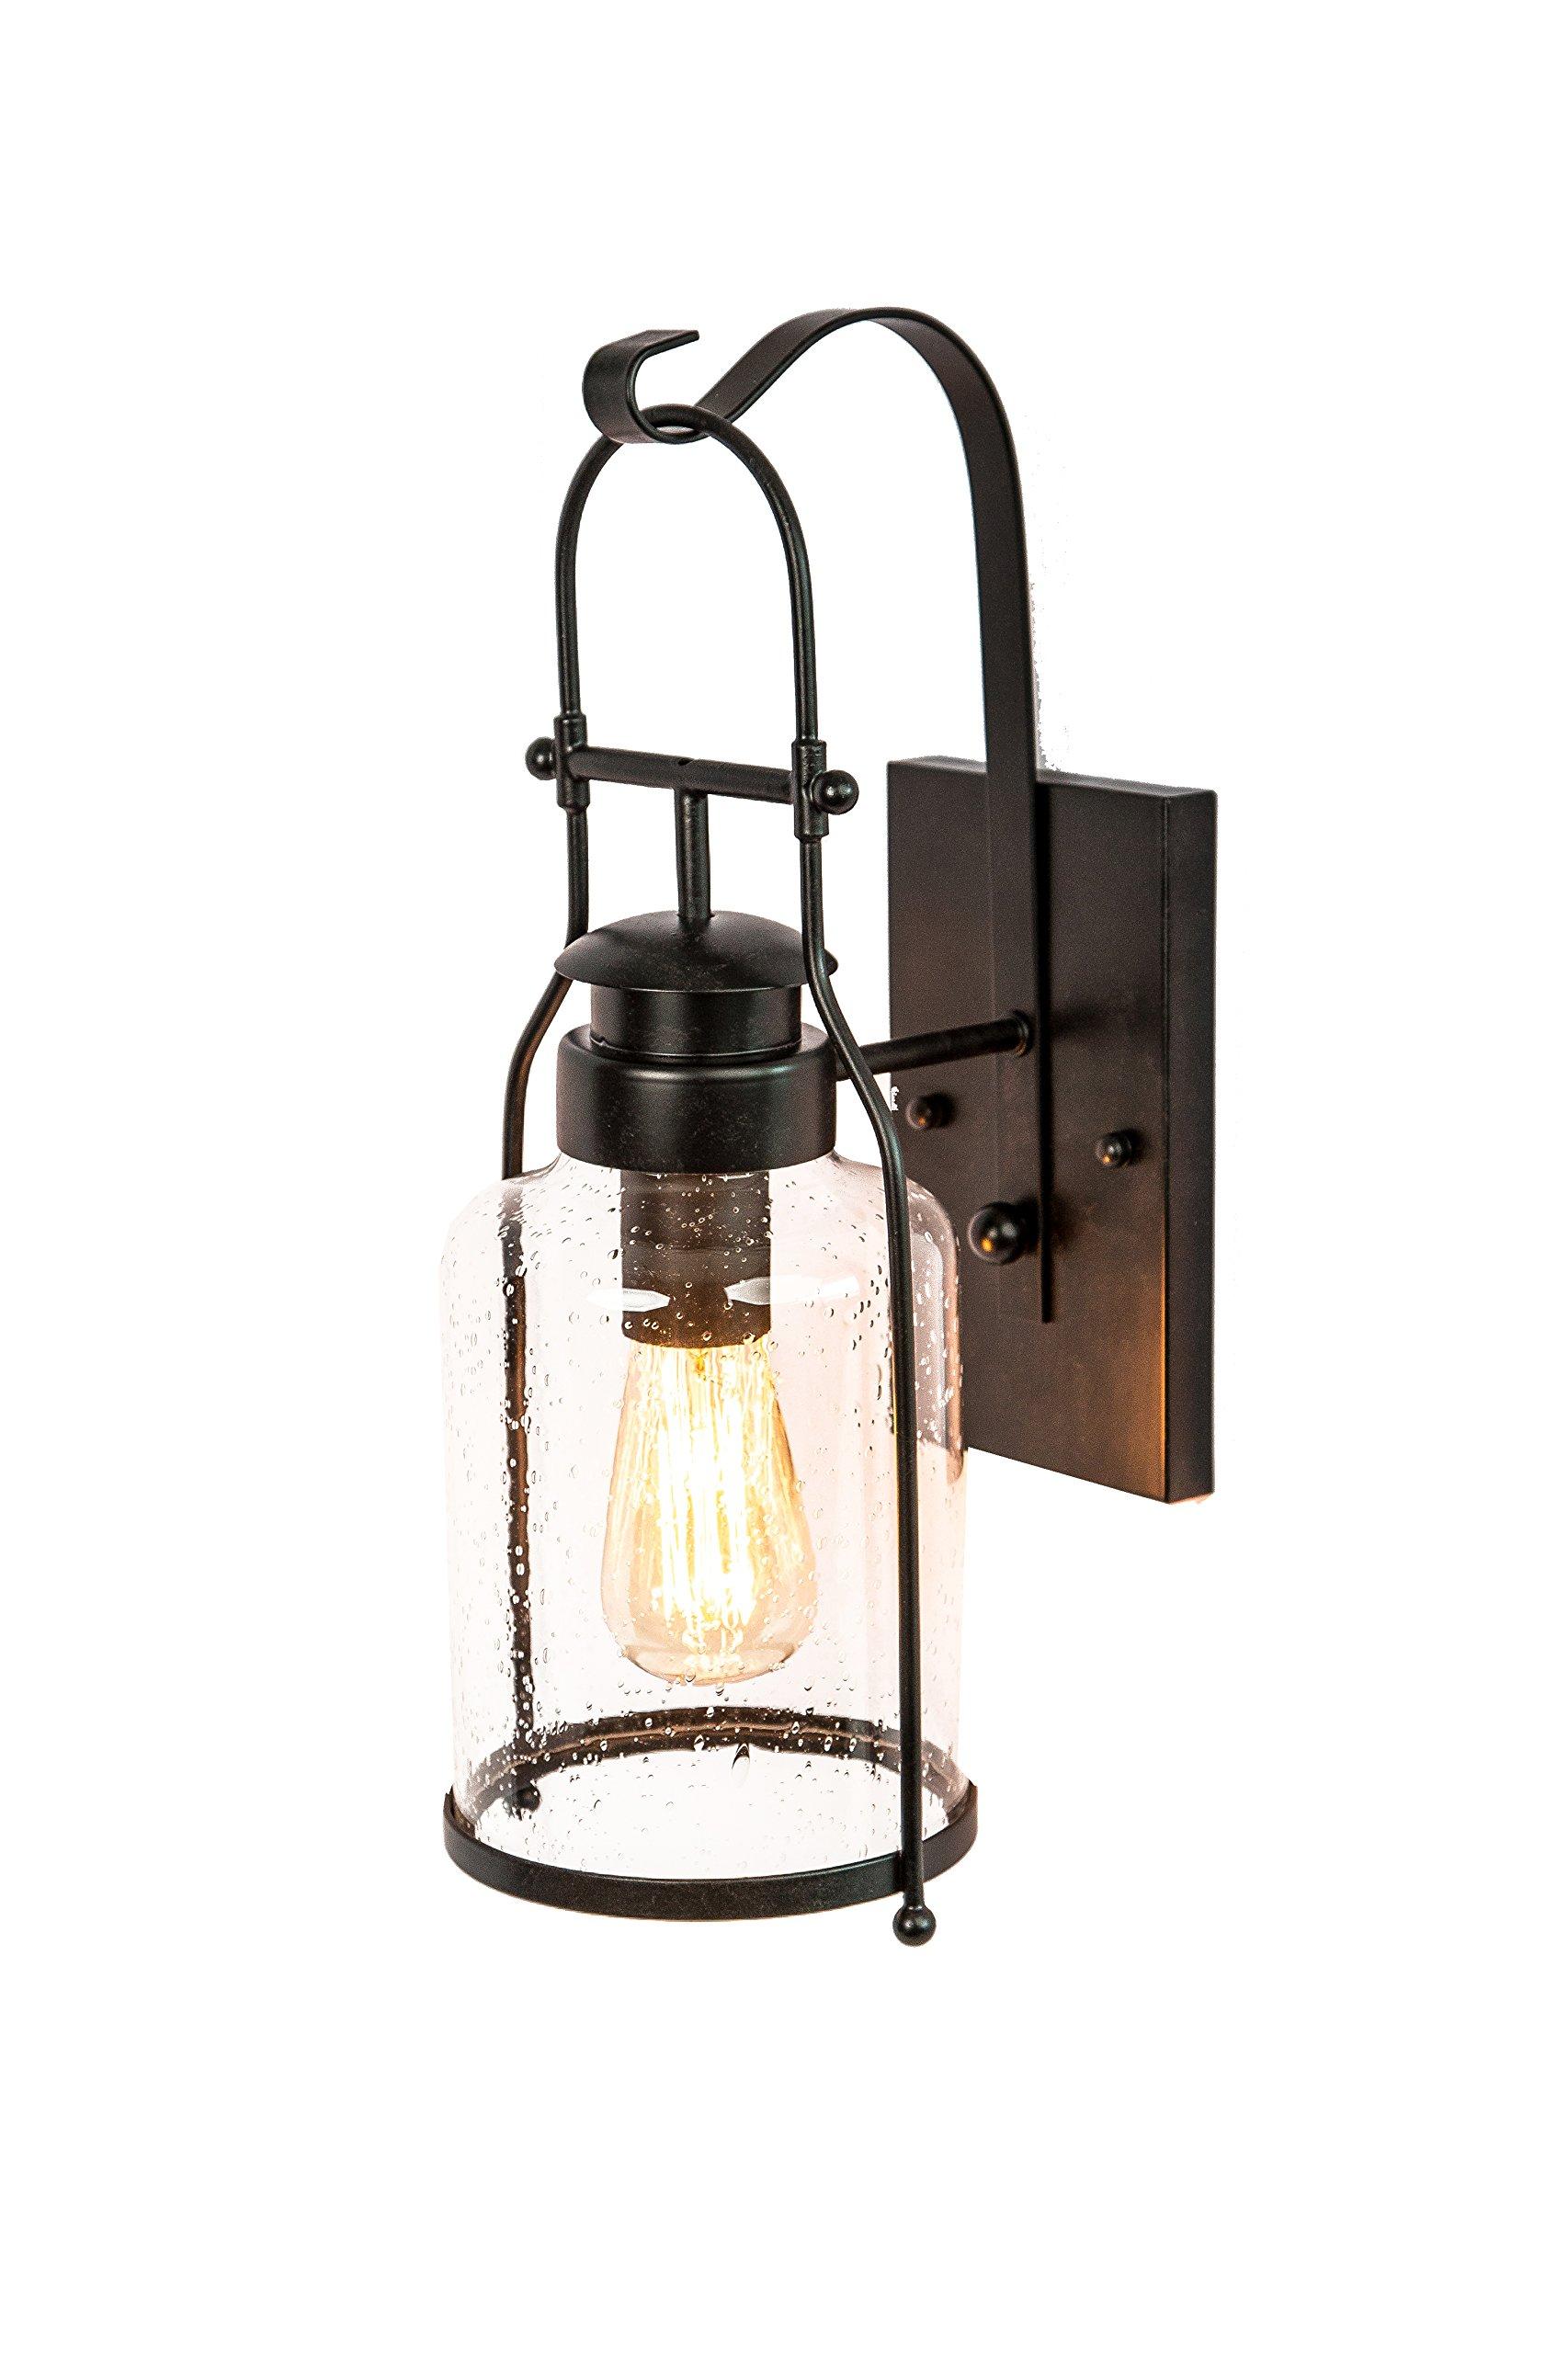 Rustic Wall Light Lantern with Retro Industrial loft Lantern Look in Rubbed Bronze Powder Coat Finish with Milk Pioneer jug Glass